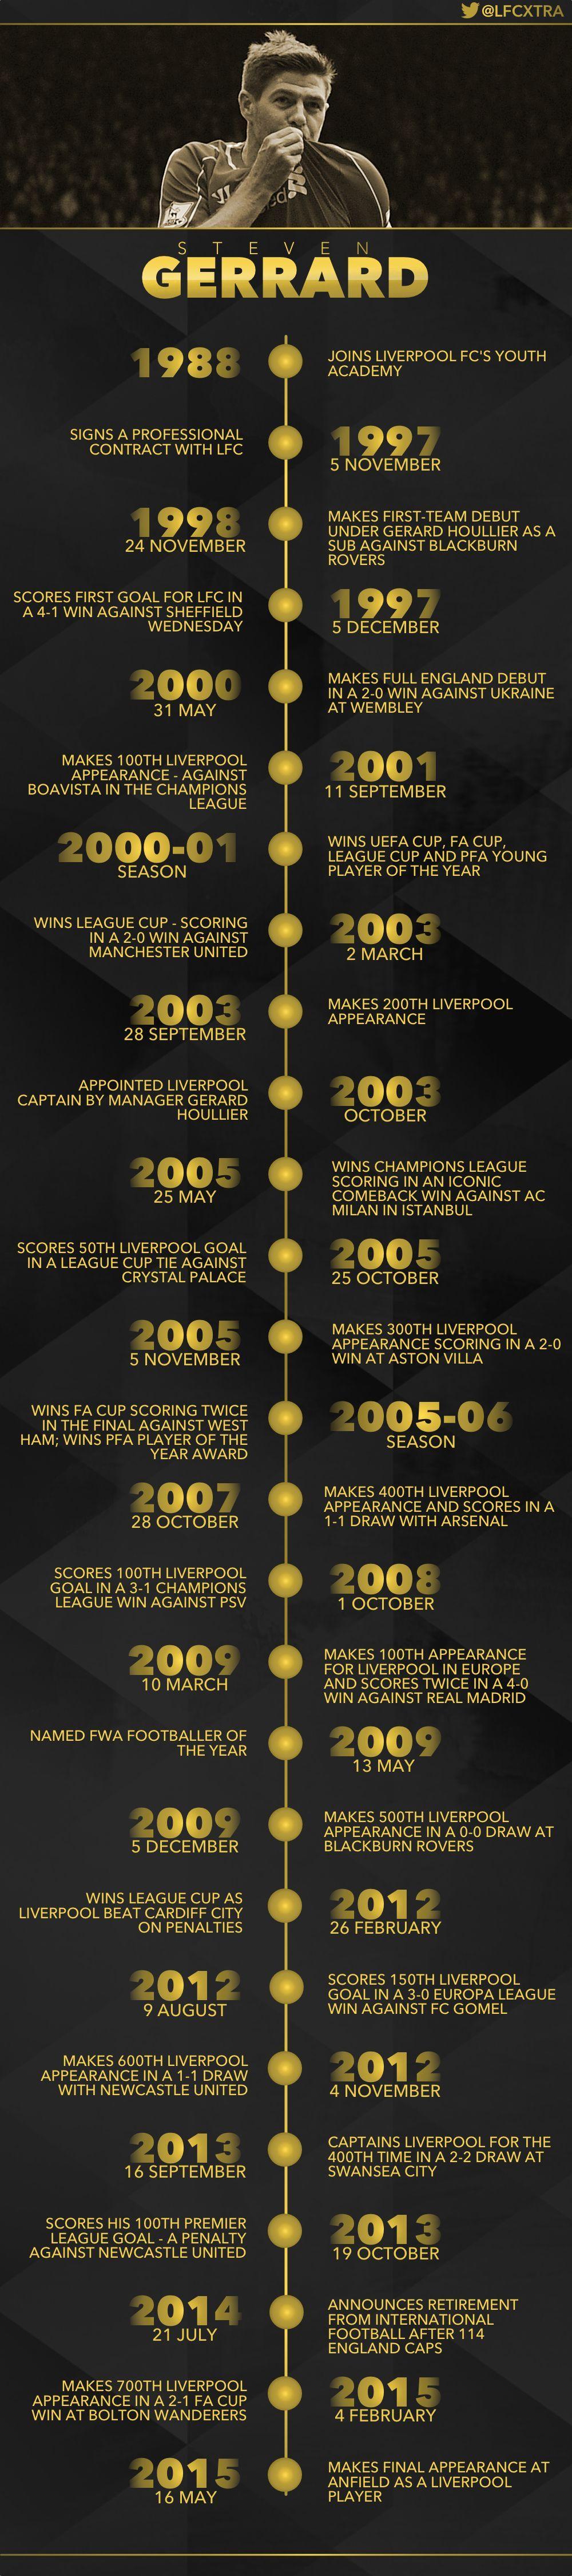 Amazing infographic of Steven Gerrard's Liverpool career - Liverpool FC